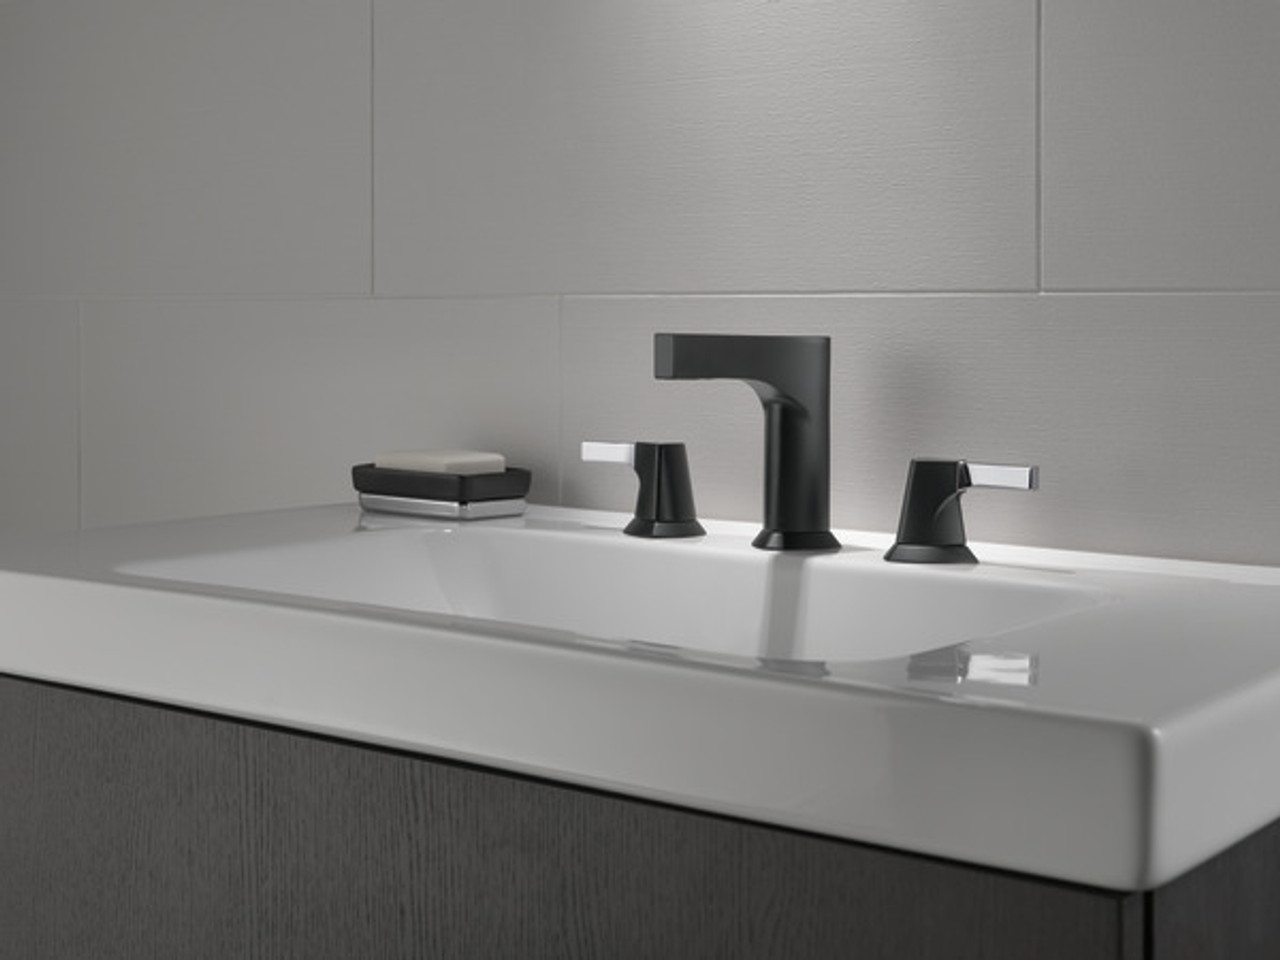 delta zura two handle widespread lavatory faucet finish chrome matte black